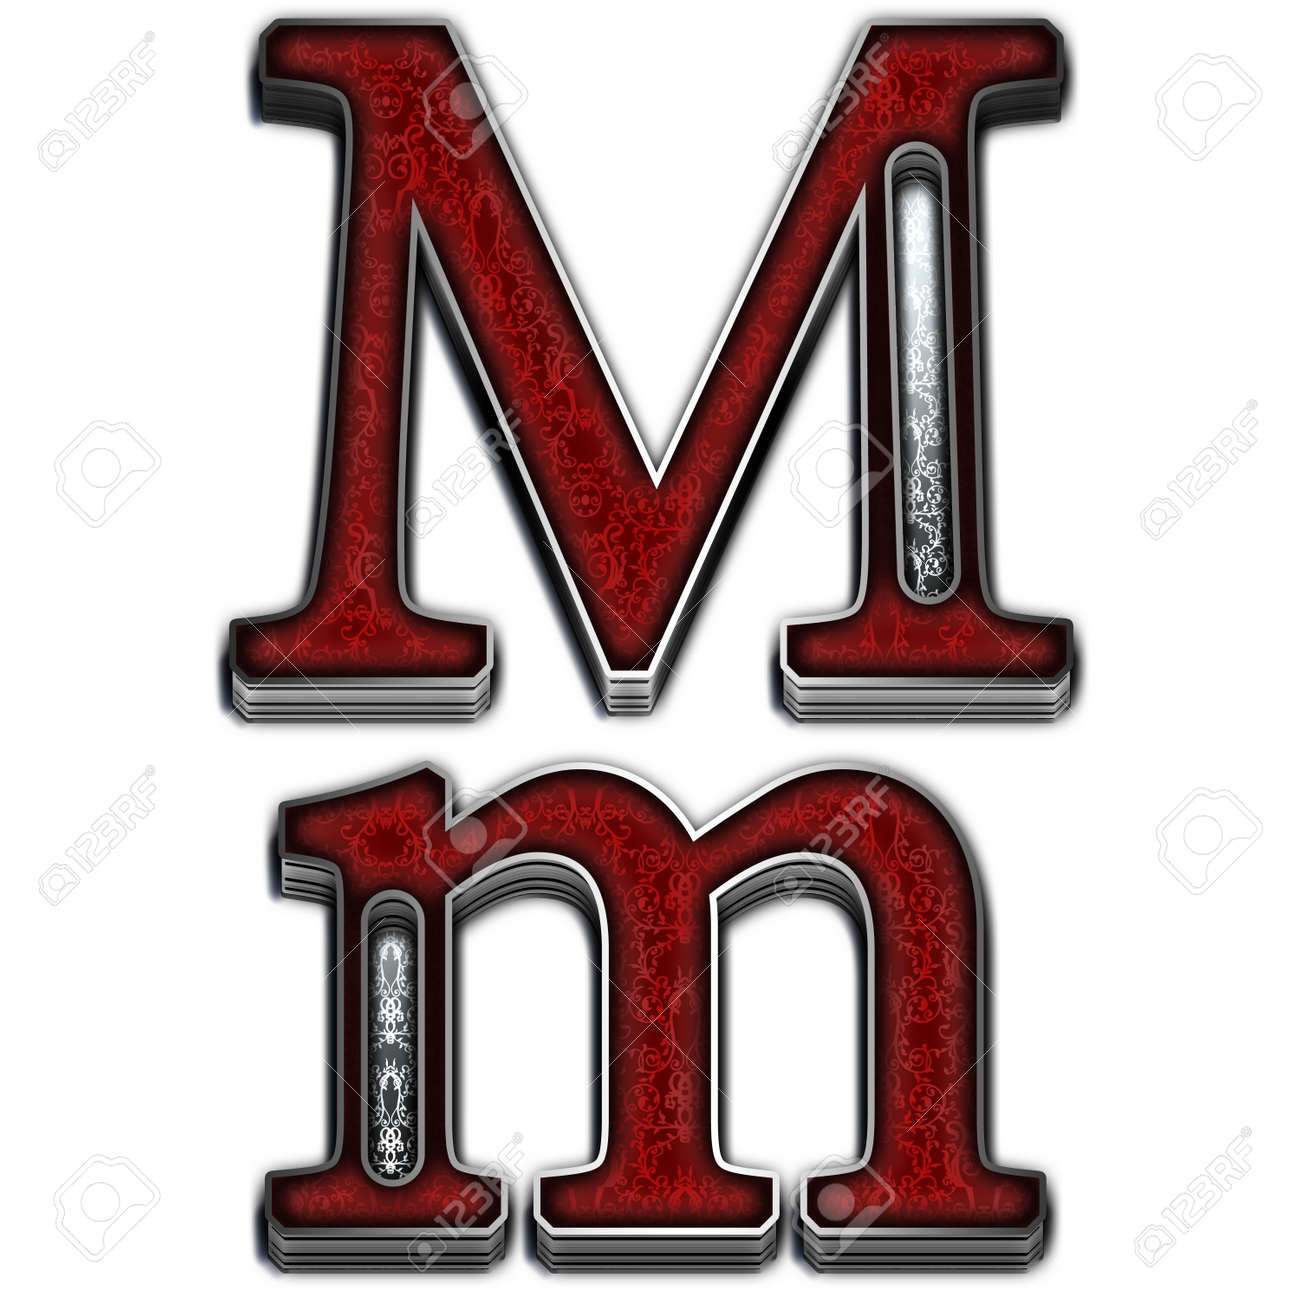 Metal alphabet symbol for web or writing Stock Photo - 8510169